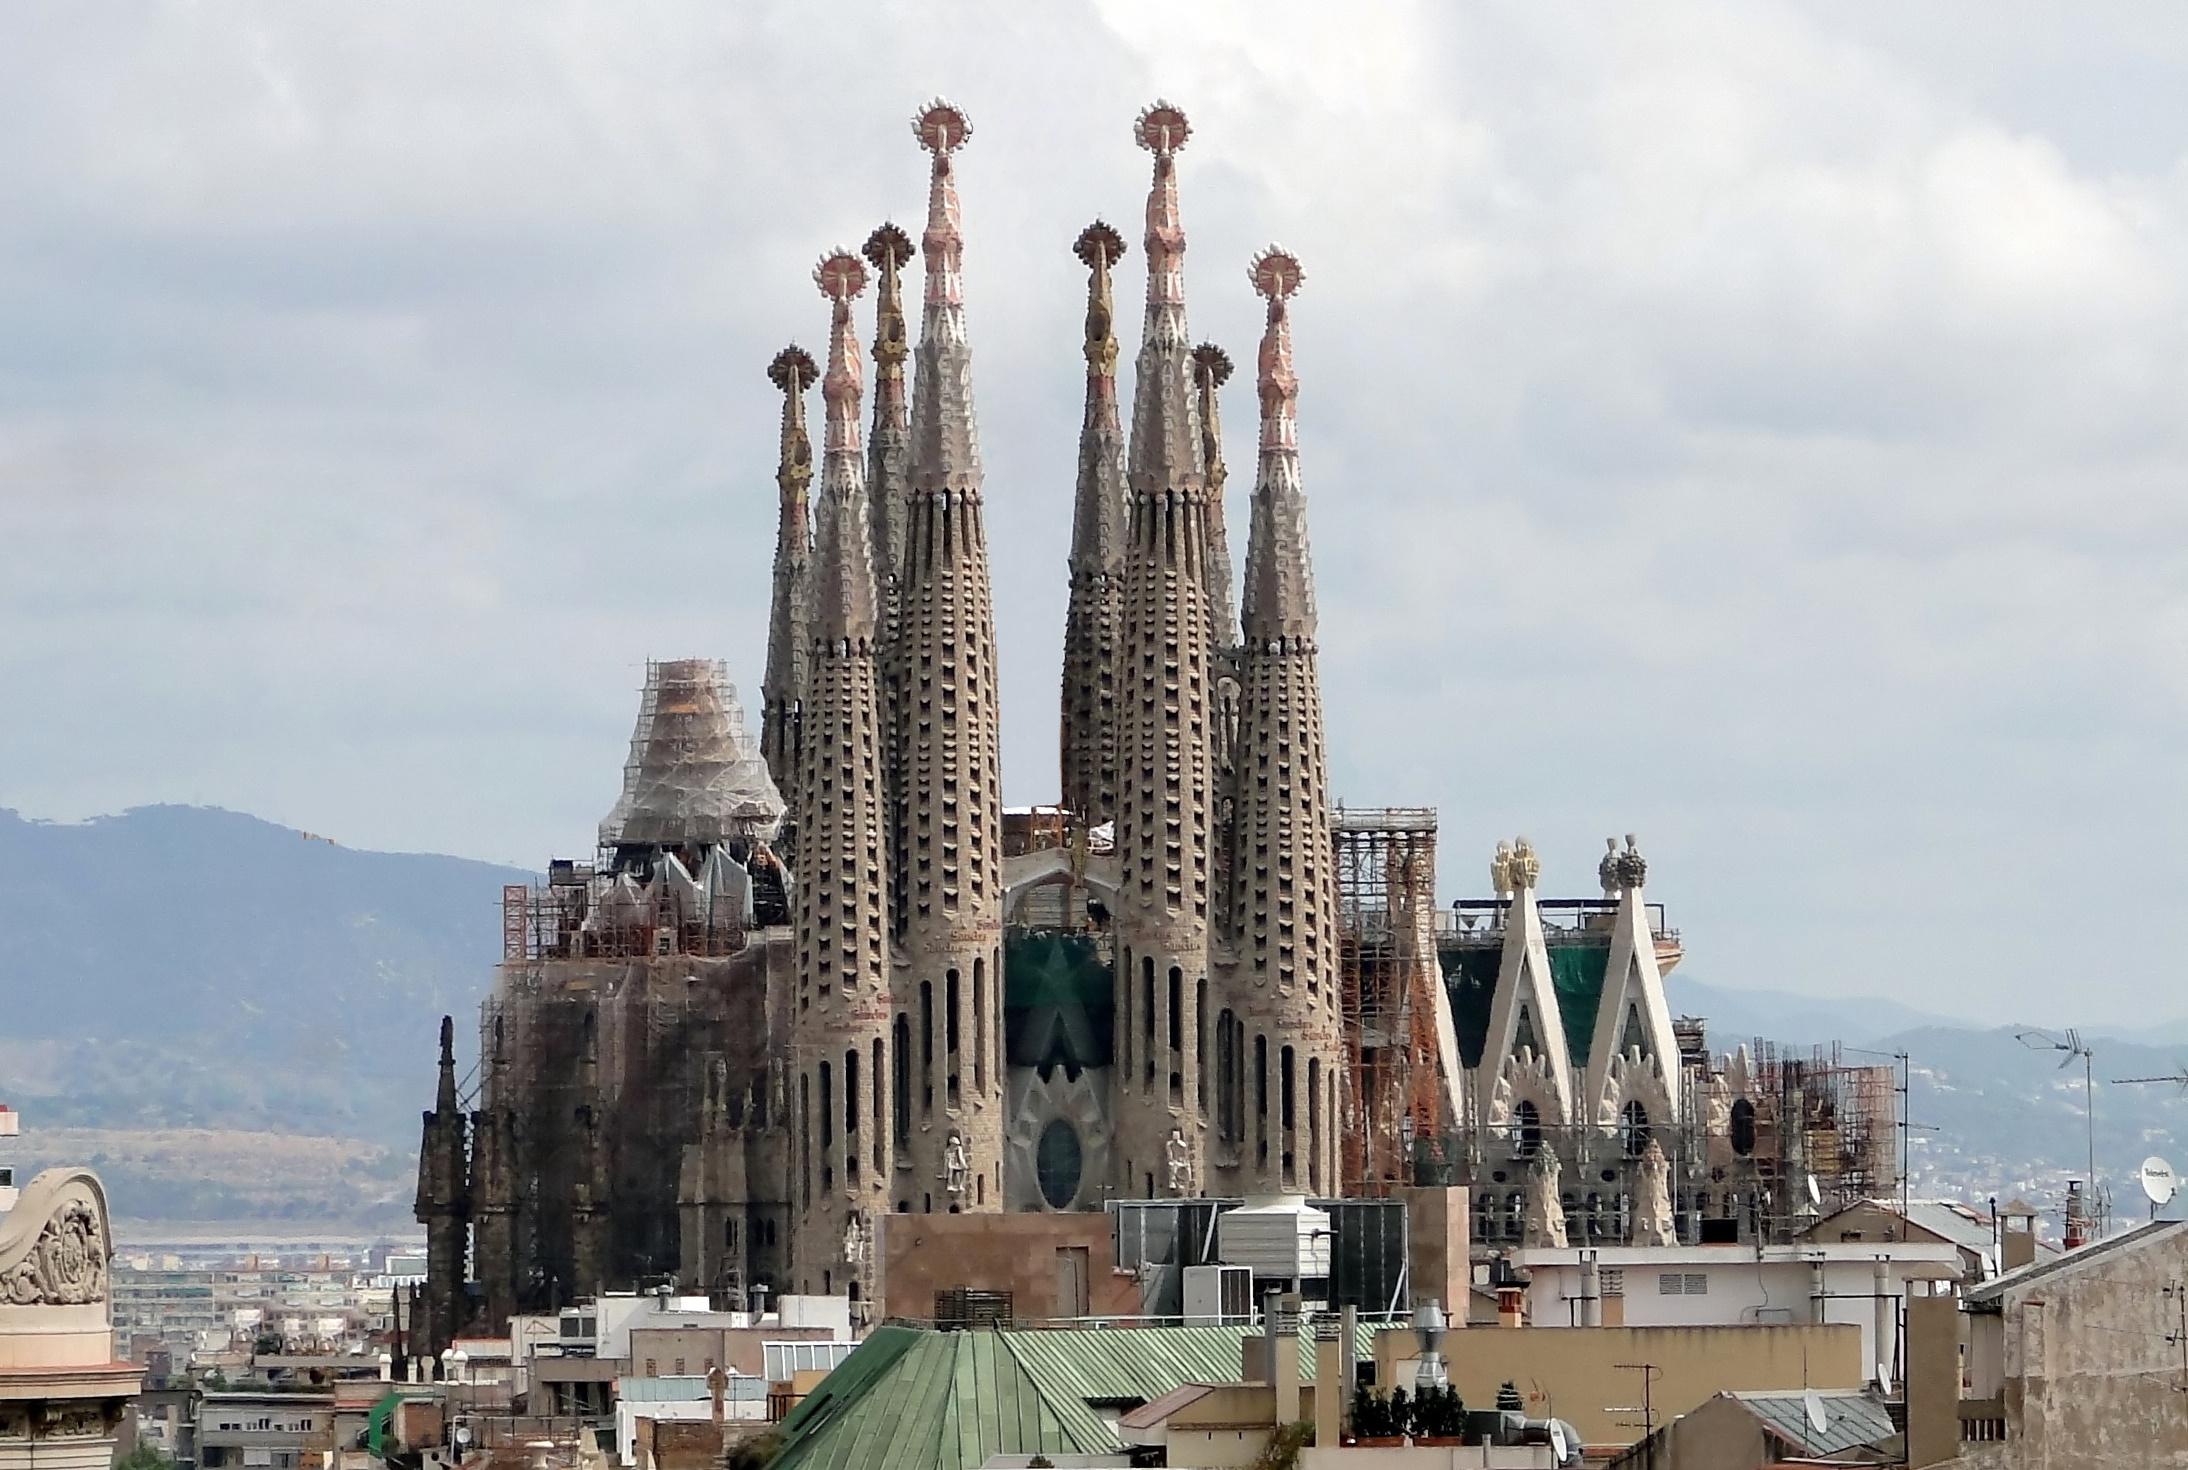 File:Sagrada Familia 01.jpg - Wikimedia Commons